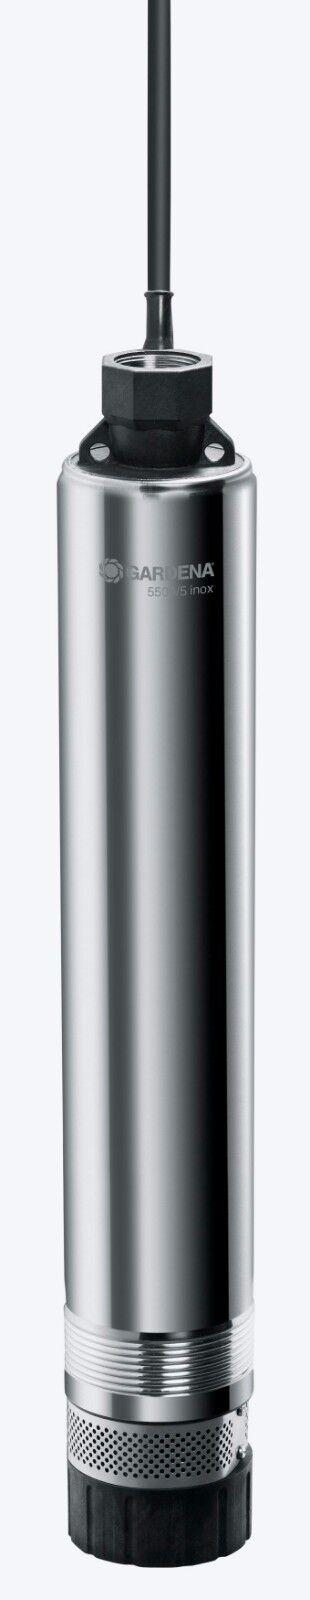 Gardena premium profundo pozo bomba 5500 5 INOX (1489)